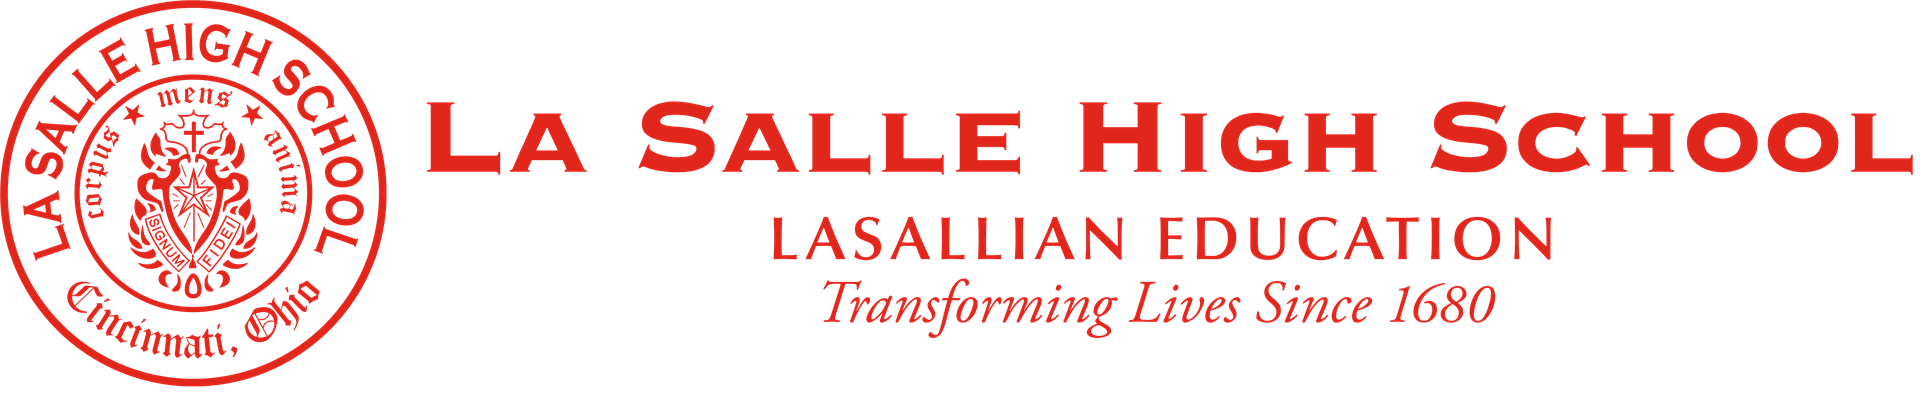 La Salle High School